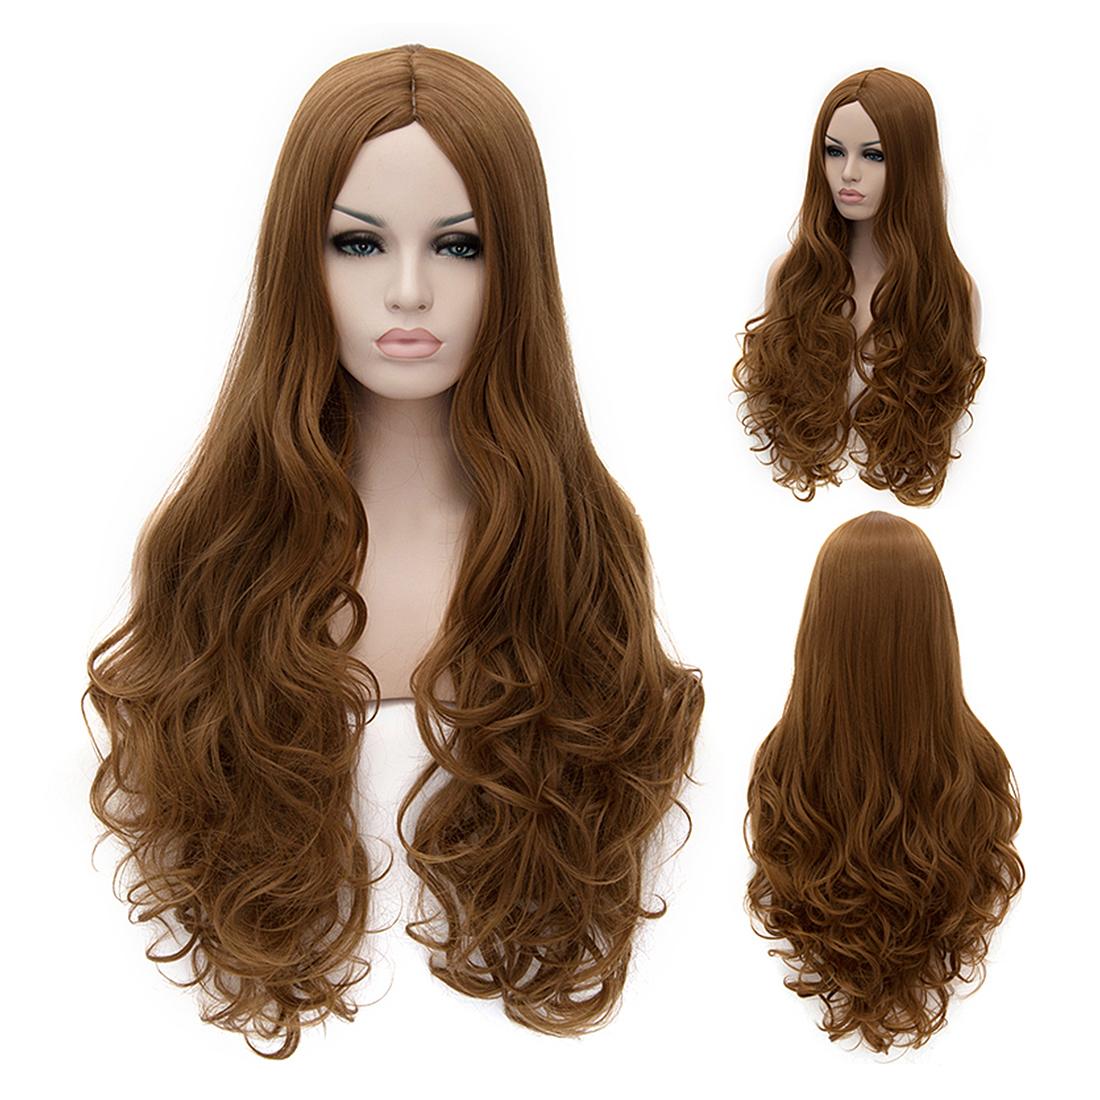 COSPLAY ACG Costume Women Wig Hair,CoastaCloud High Quali...